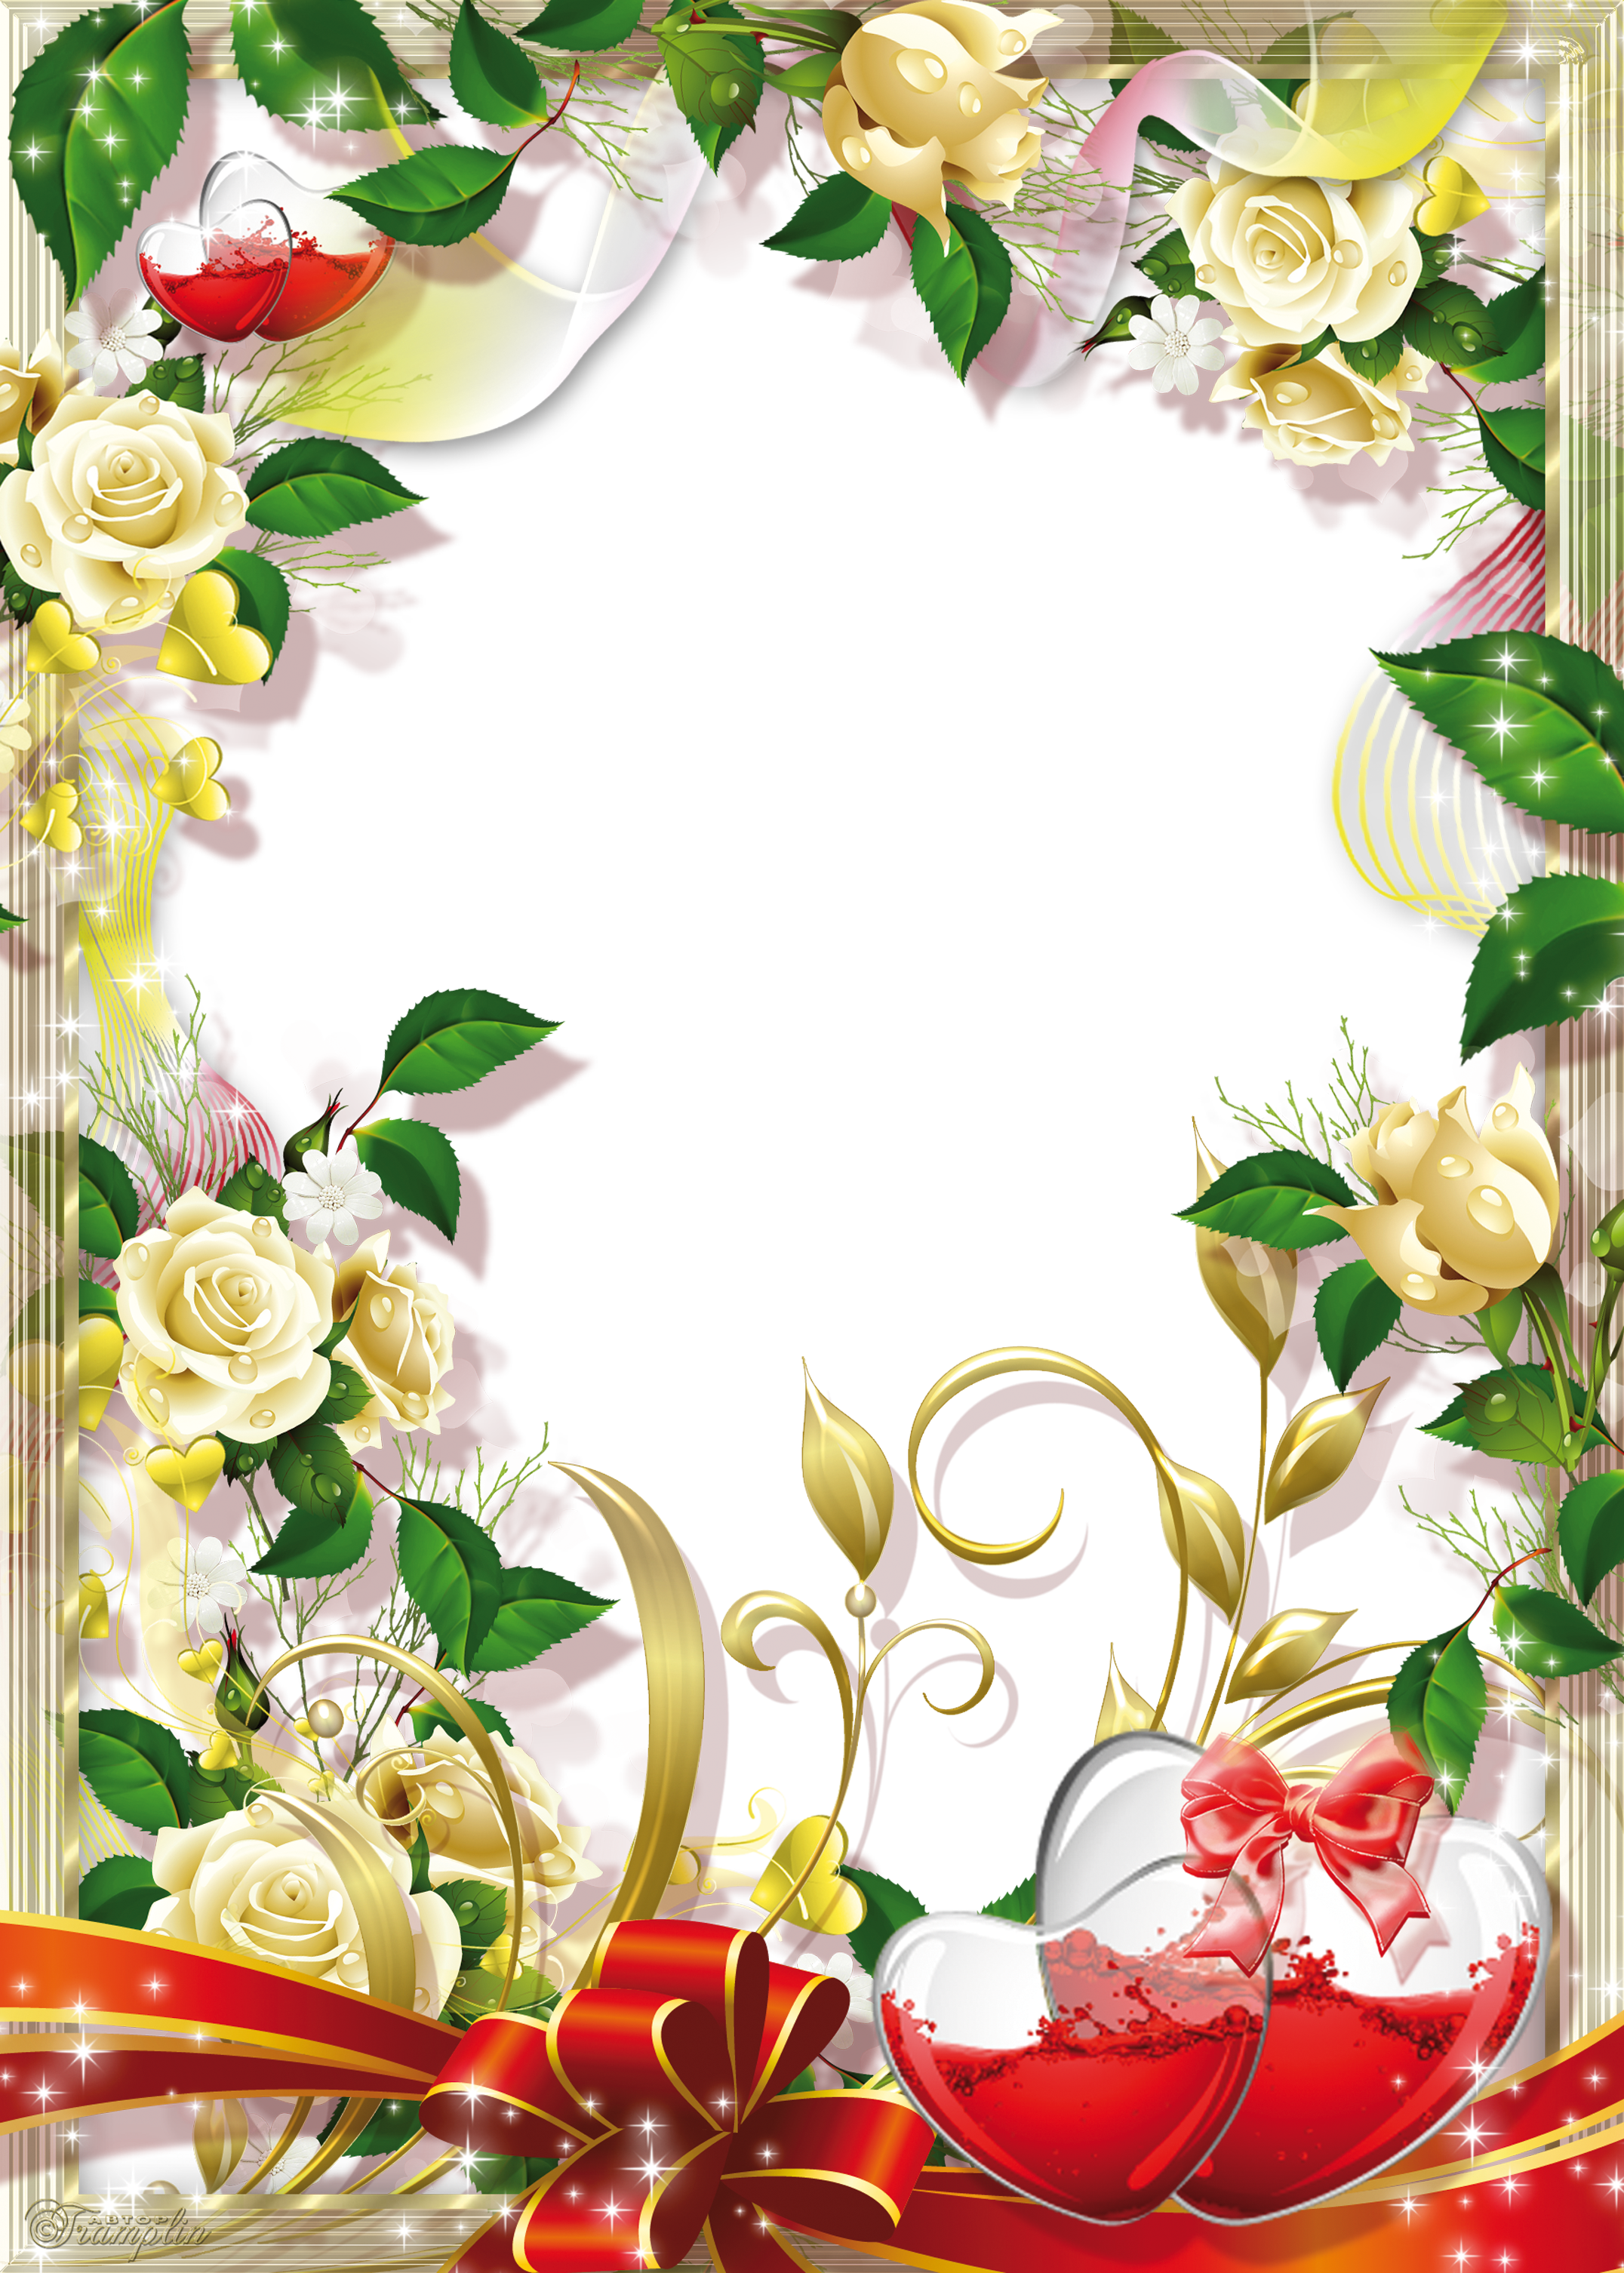 http://img-fotki.yandex.ru/get/4131/41771327.34f/0_86e46_ef175826_orig.png